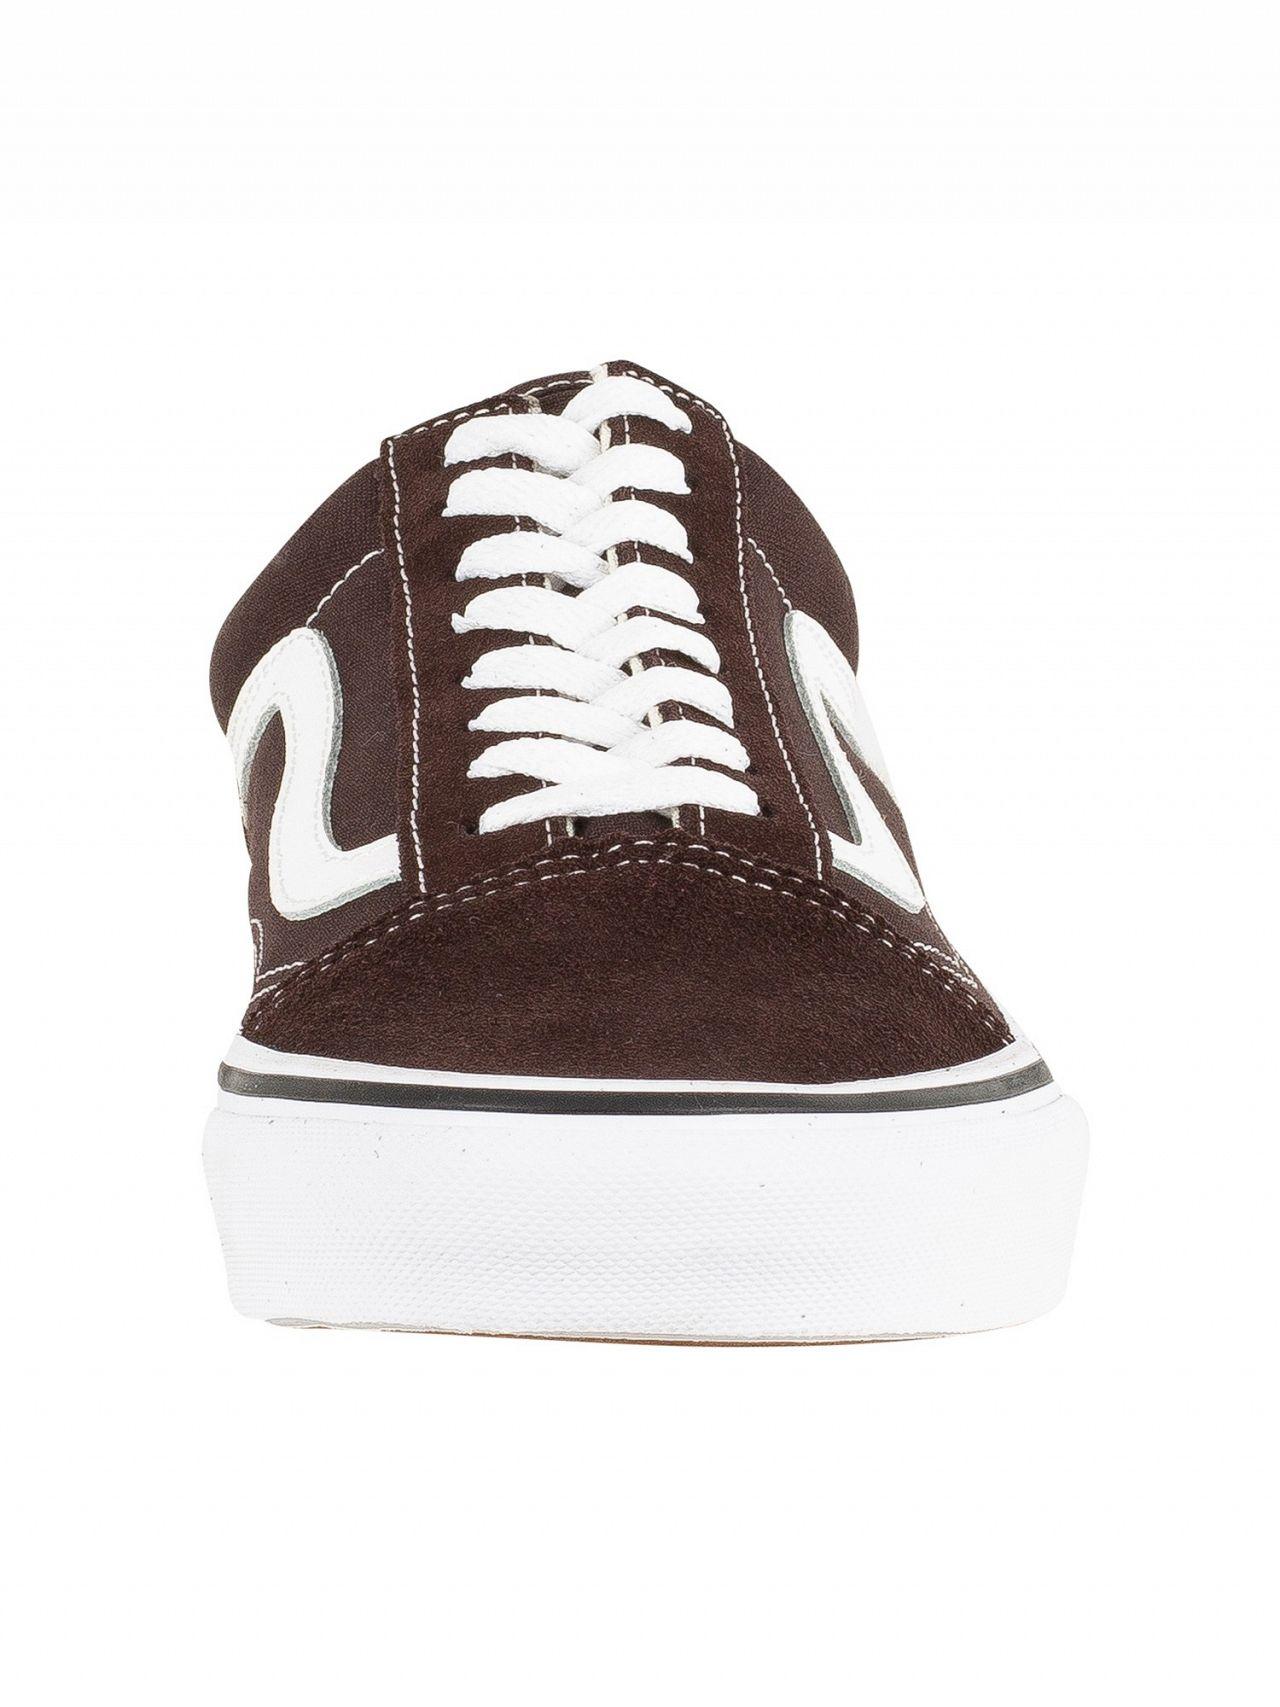 83e6fd8a10db4a Vans Chocolate Torte True White Old Skool Trainers